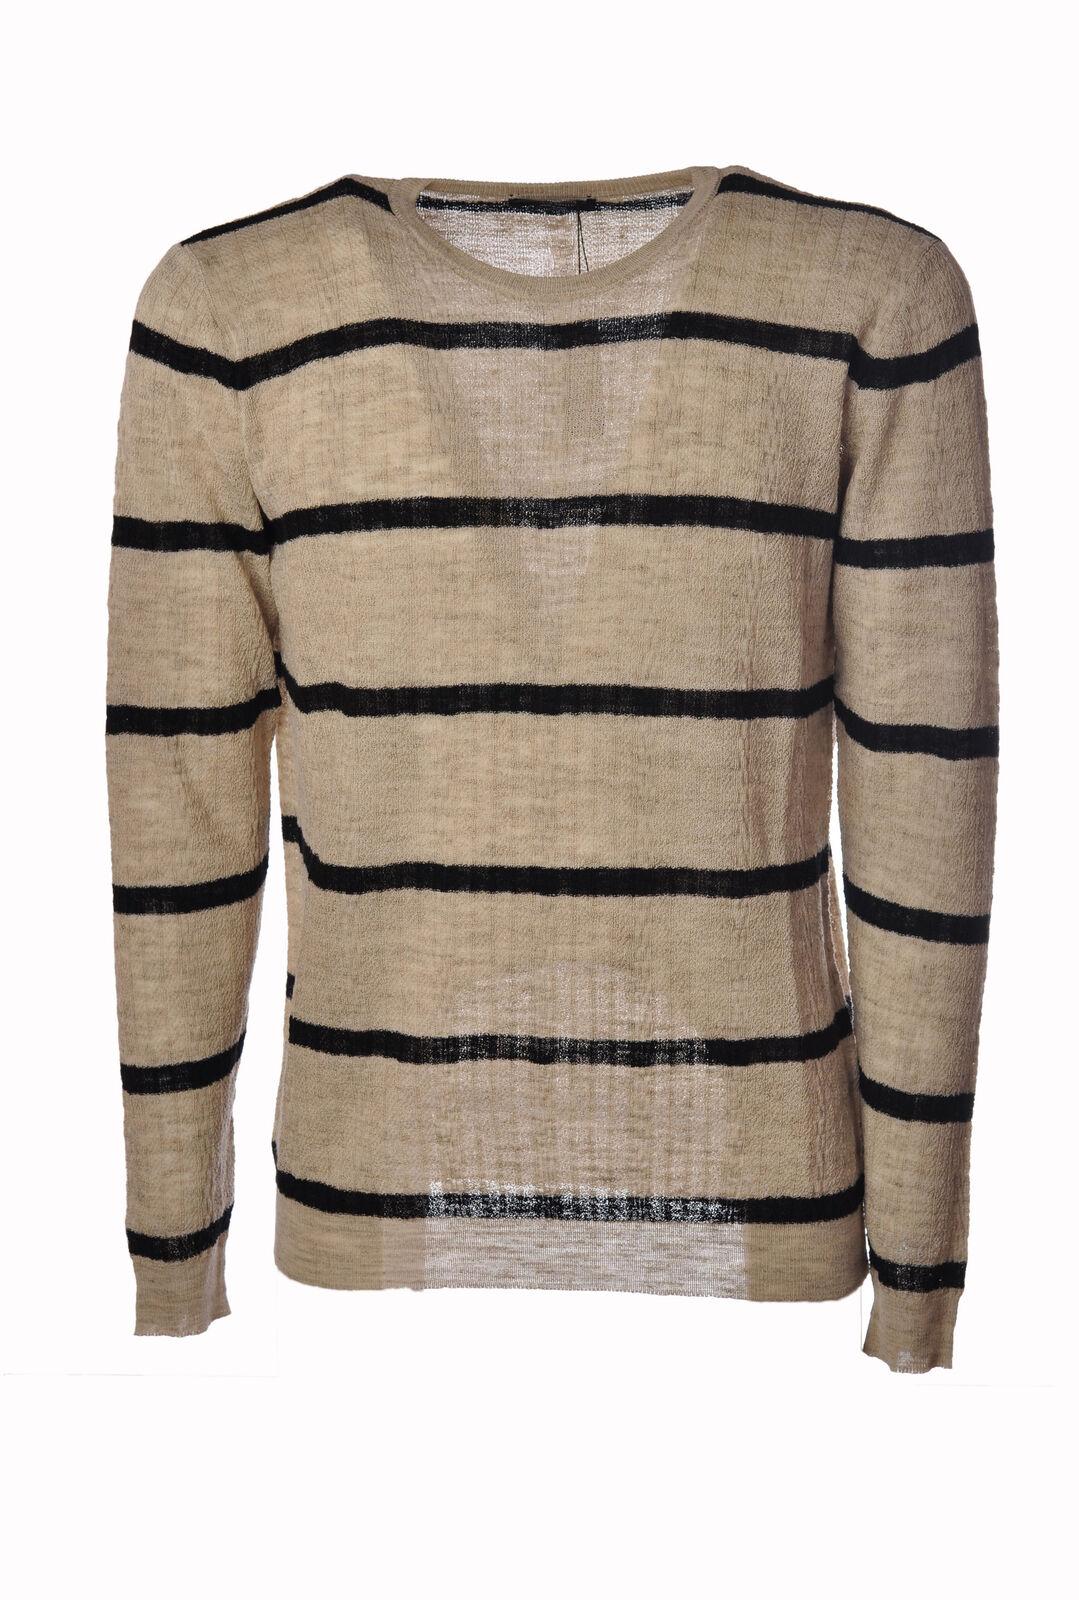 Roberto Collina  -  Sweaters - Male - Beige - 3214115A184020